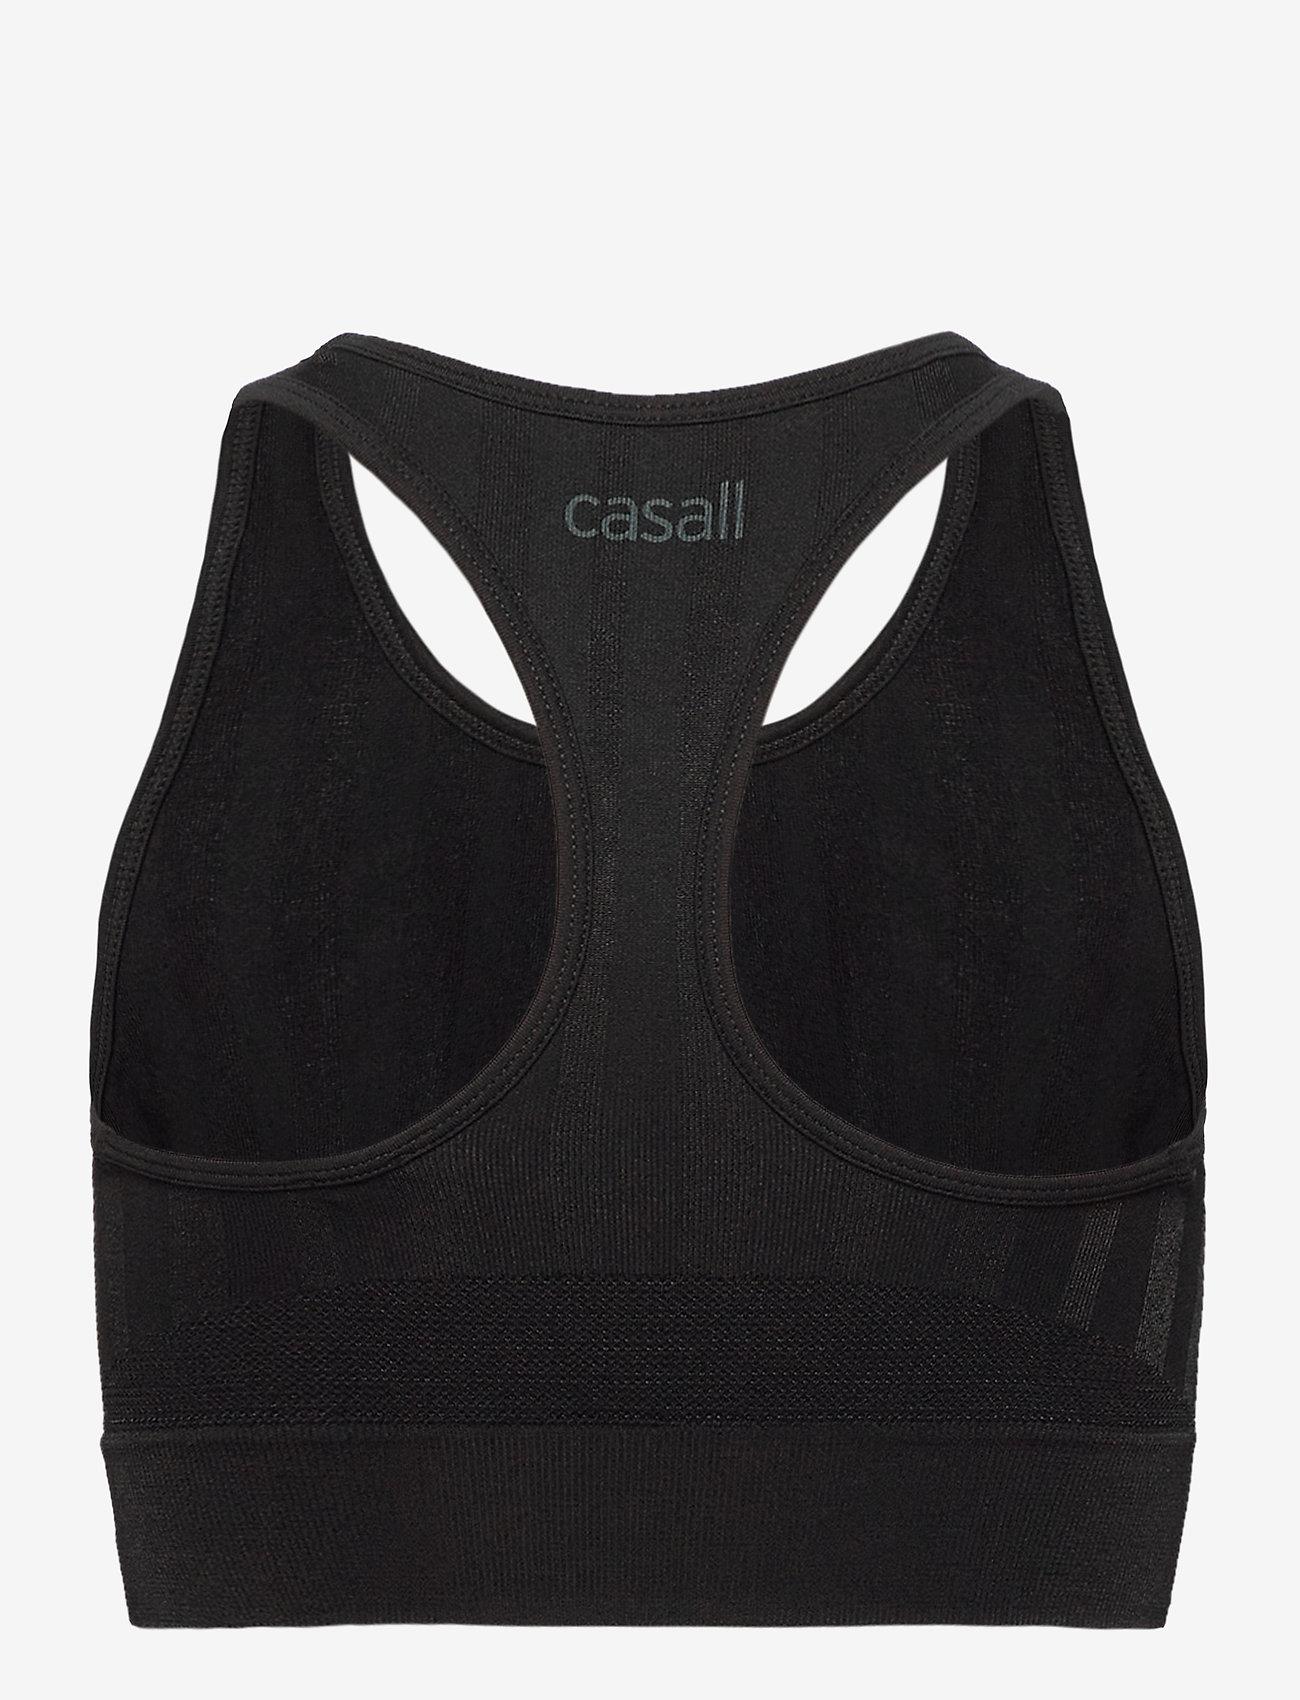 Casall - Shiny Matte Seamless Sports Top - sport-bh: hög - black - 1